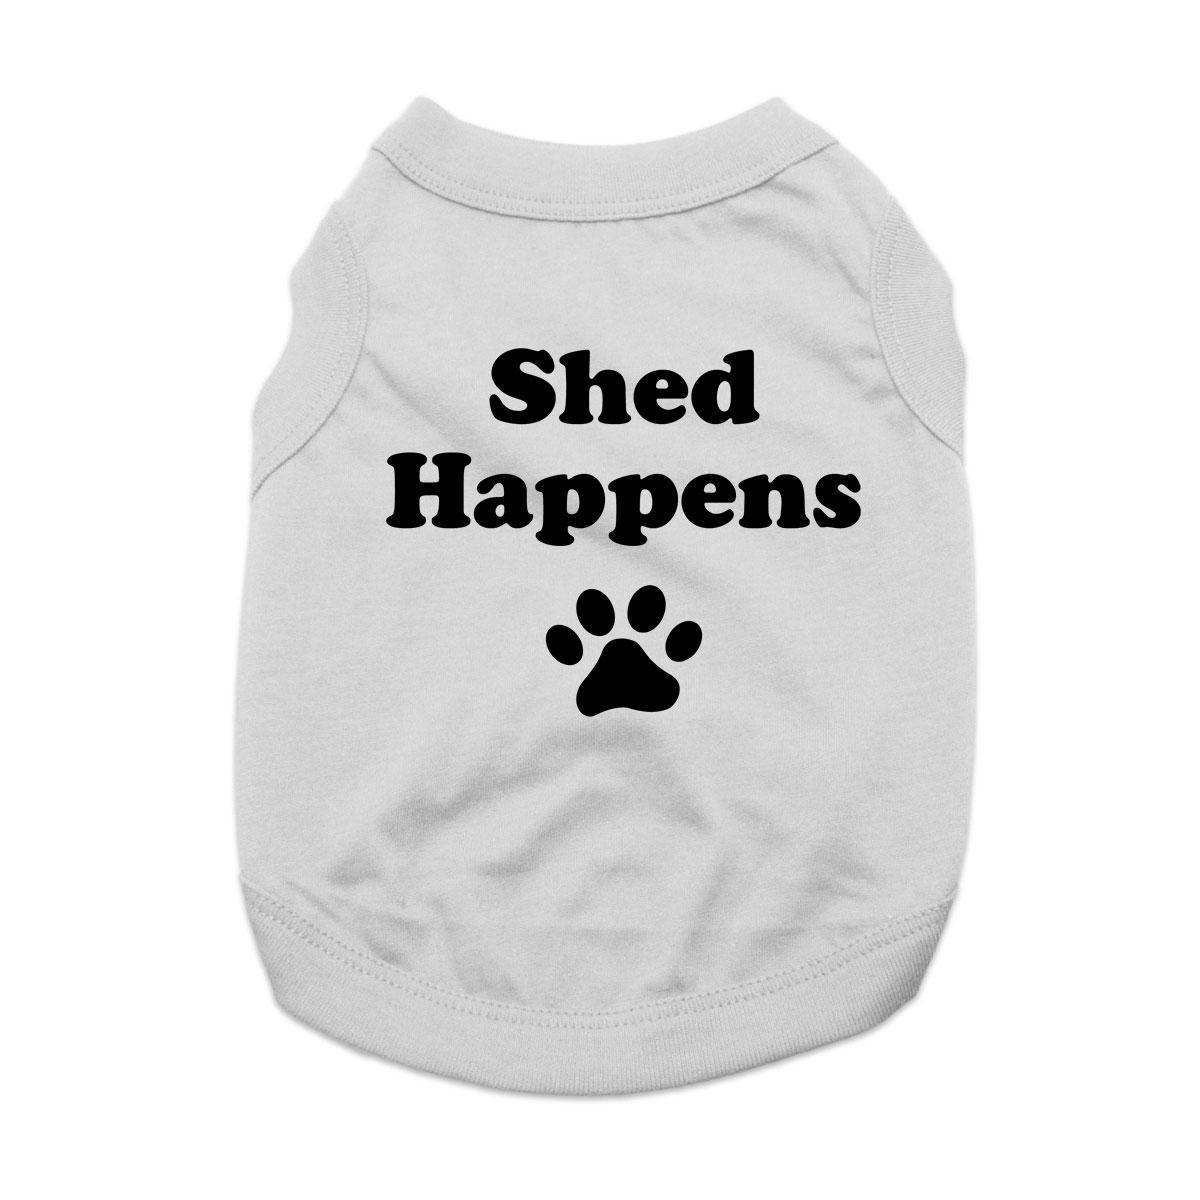 Shed Happens Dog Shirt - Gray